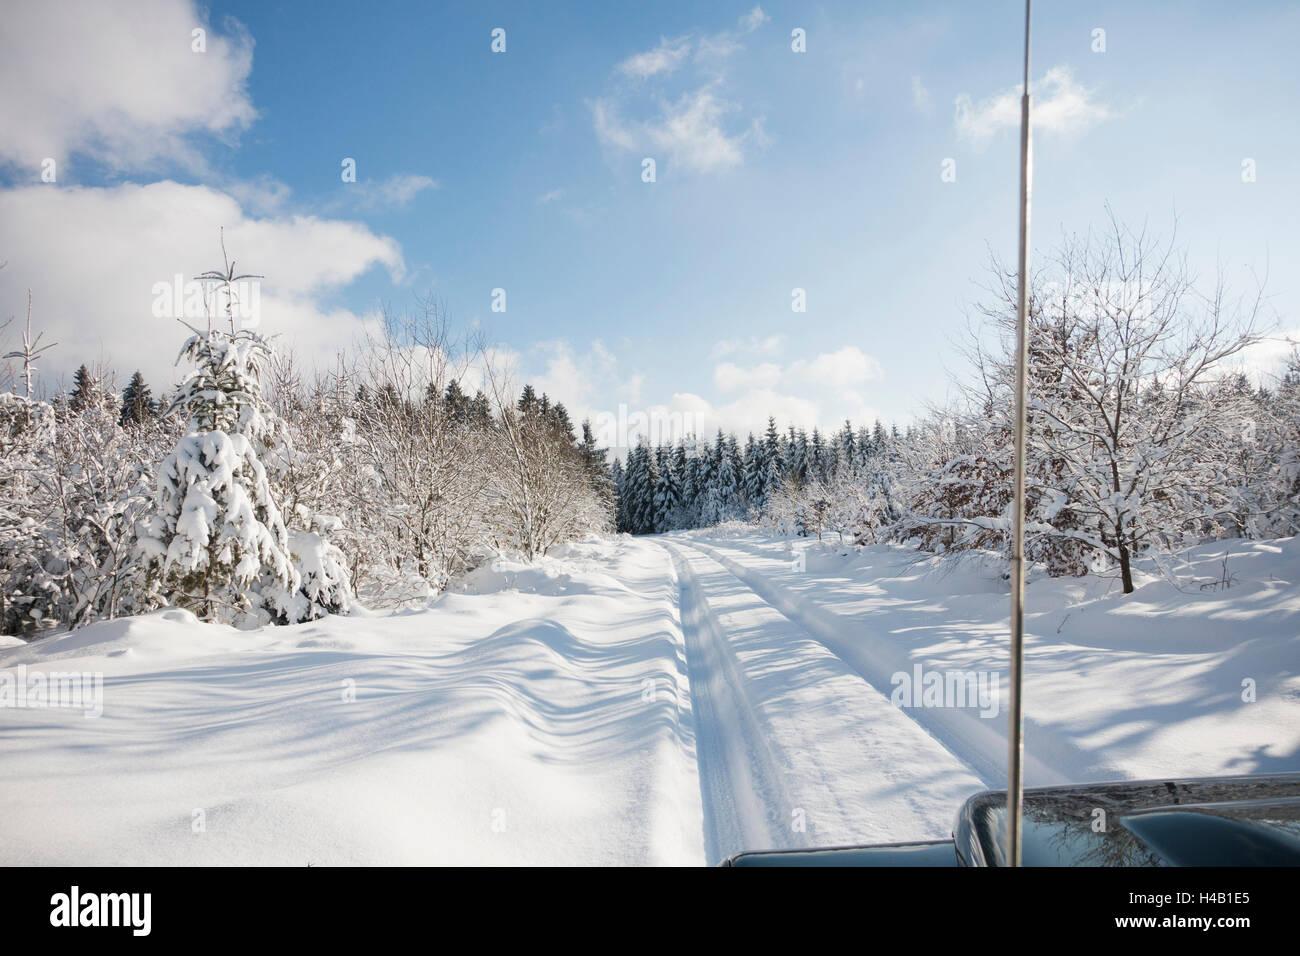 Tyre tracks in deep snow in winter scenery - Stock Image